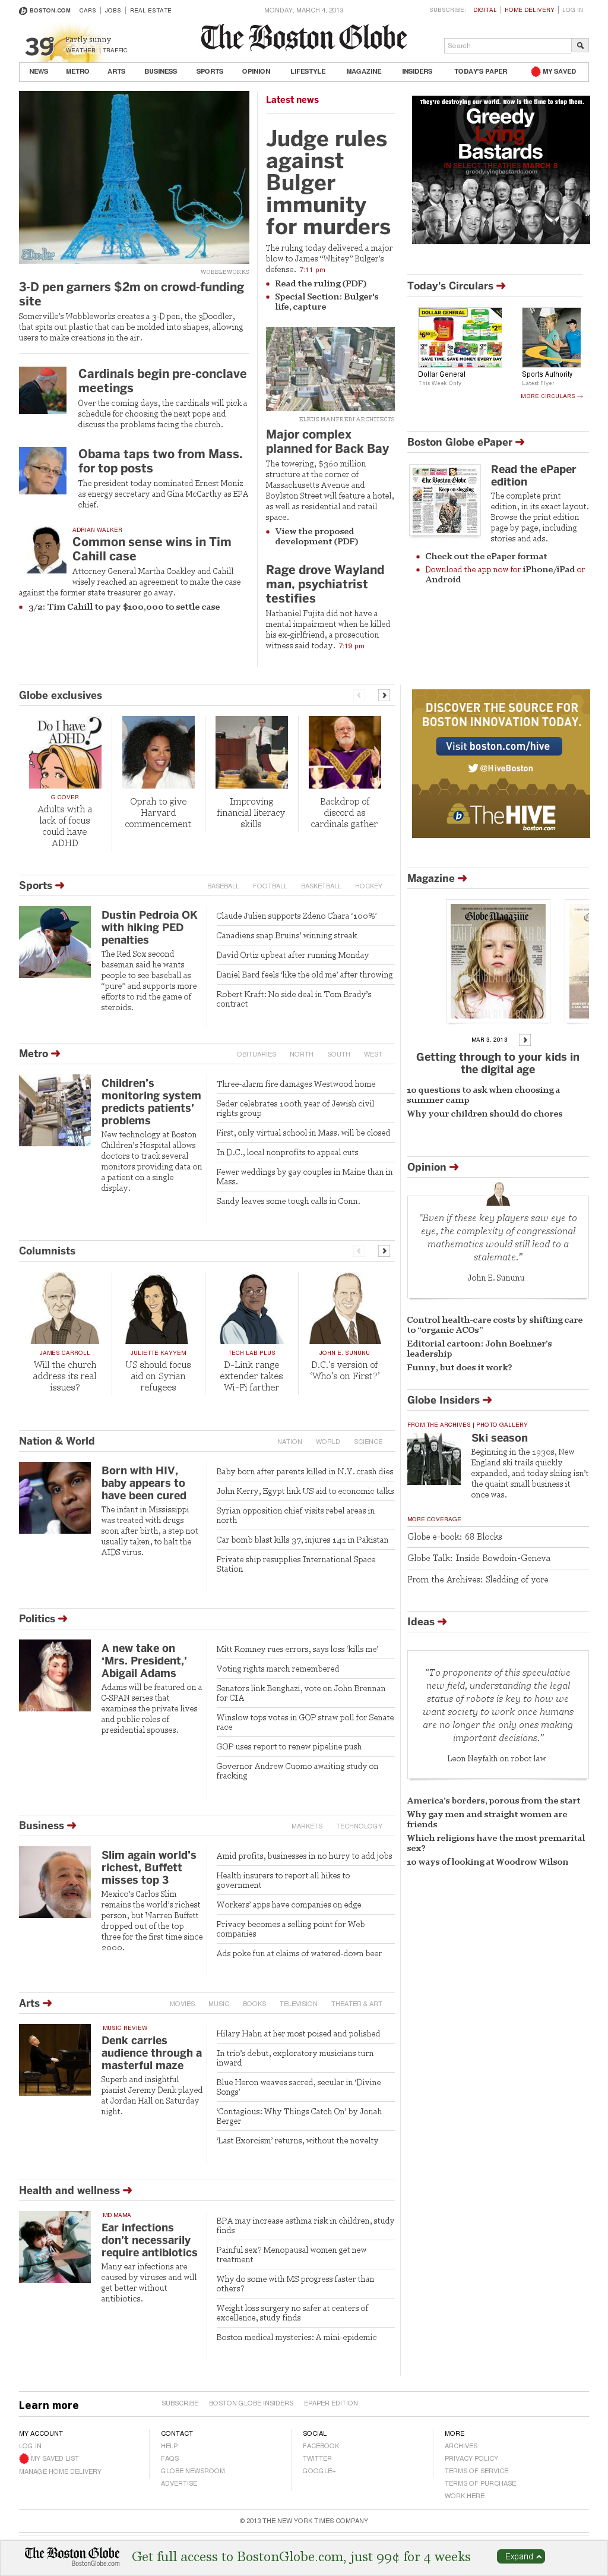 The Boston Globe at Monday March 4, 2013, 9:01 p.m. UTC